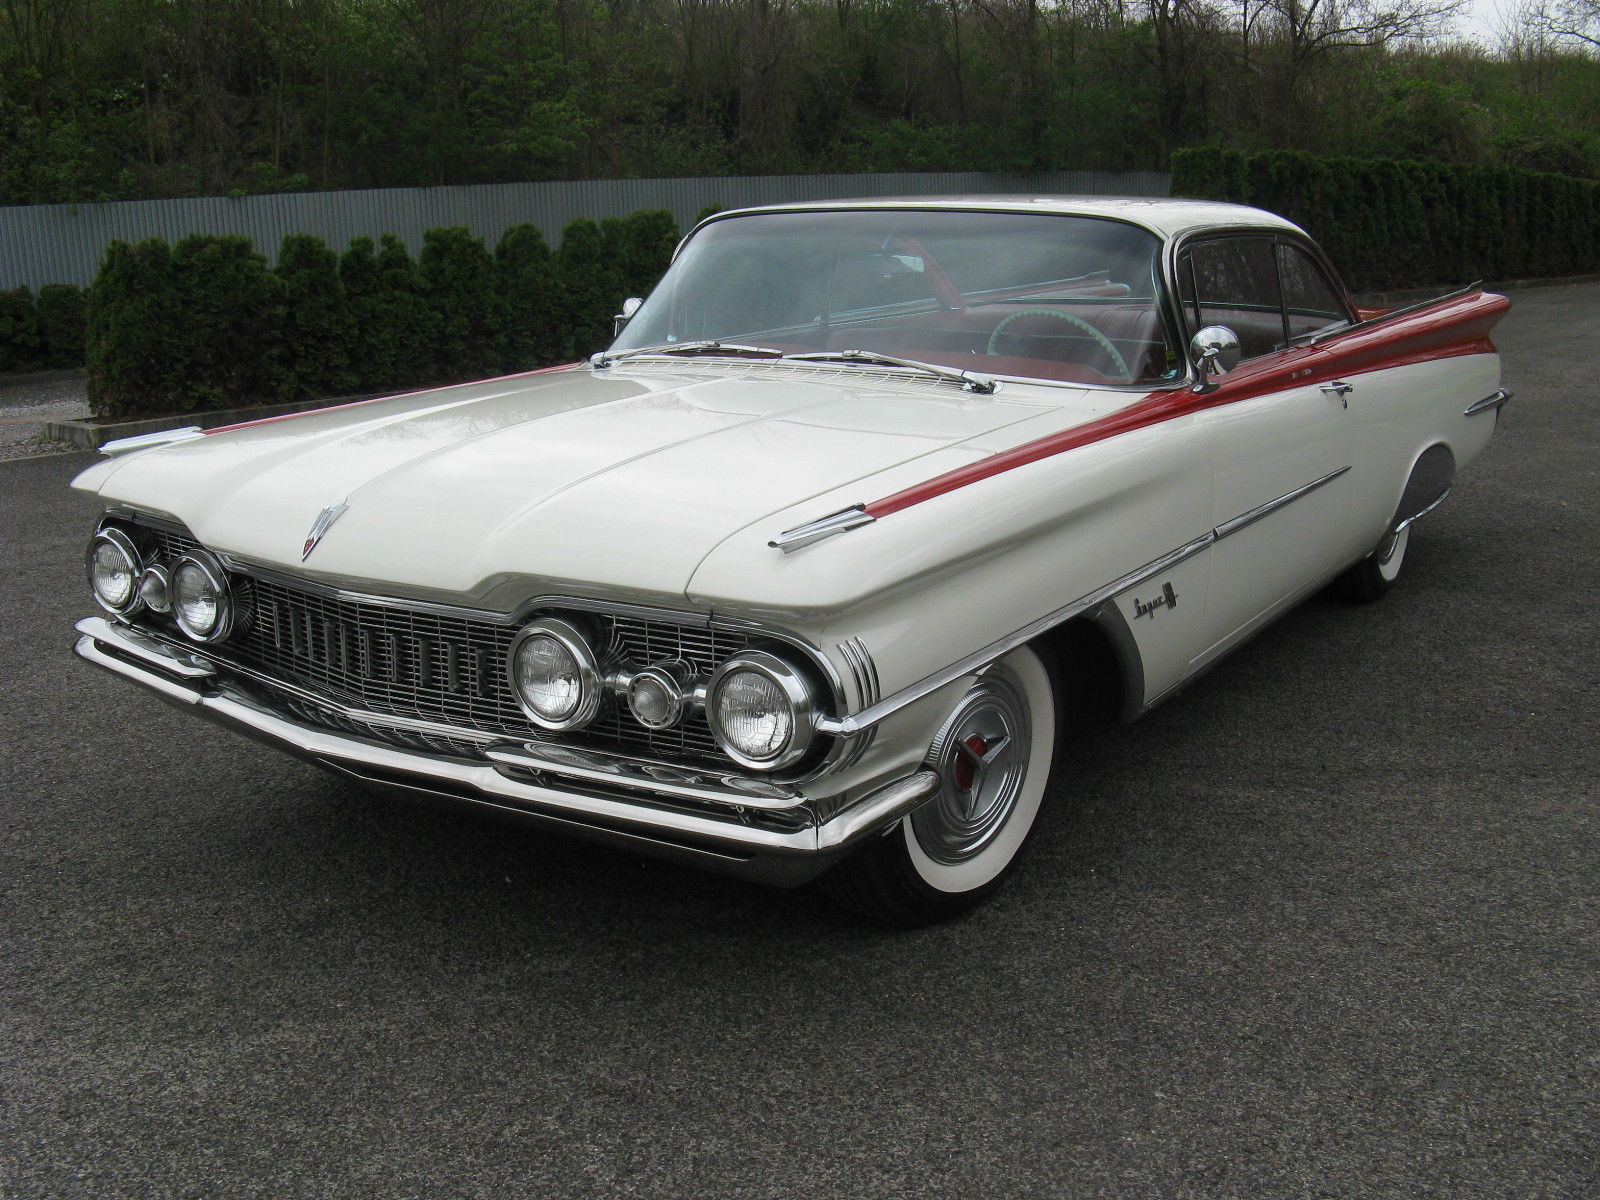 Oldsmobile Cars: All American Classic Cars: 1959 Oldsmobile Super 88 2-Door